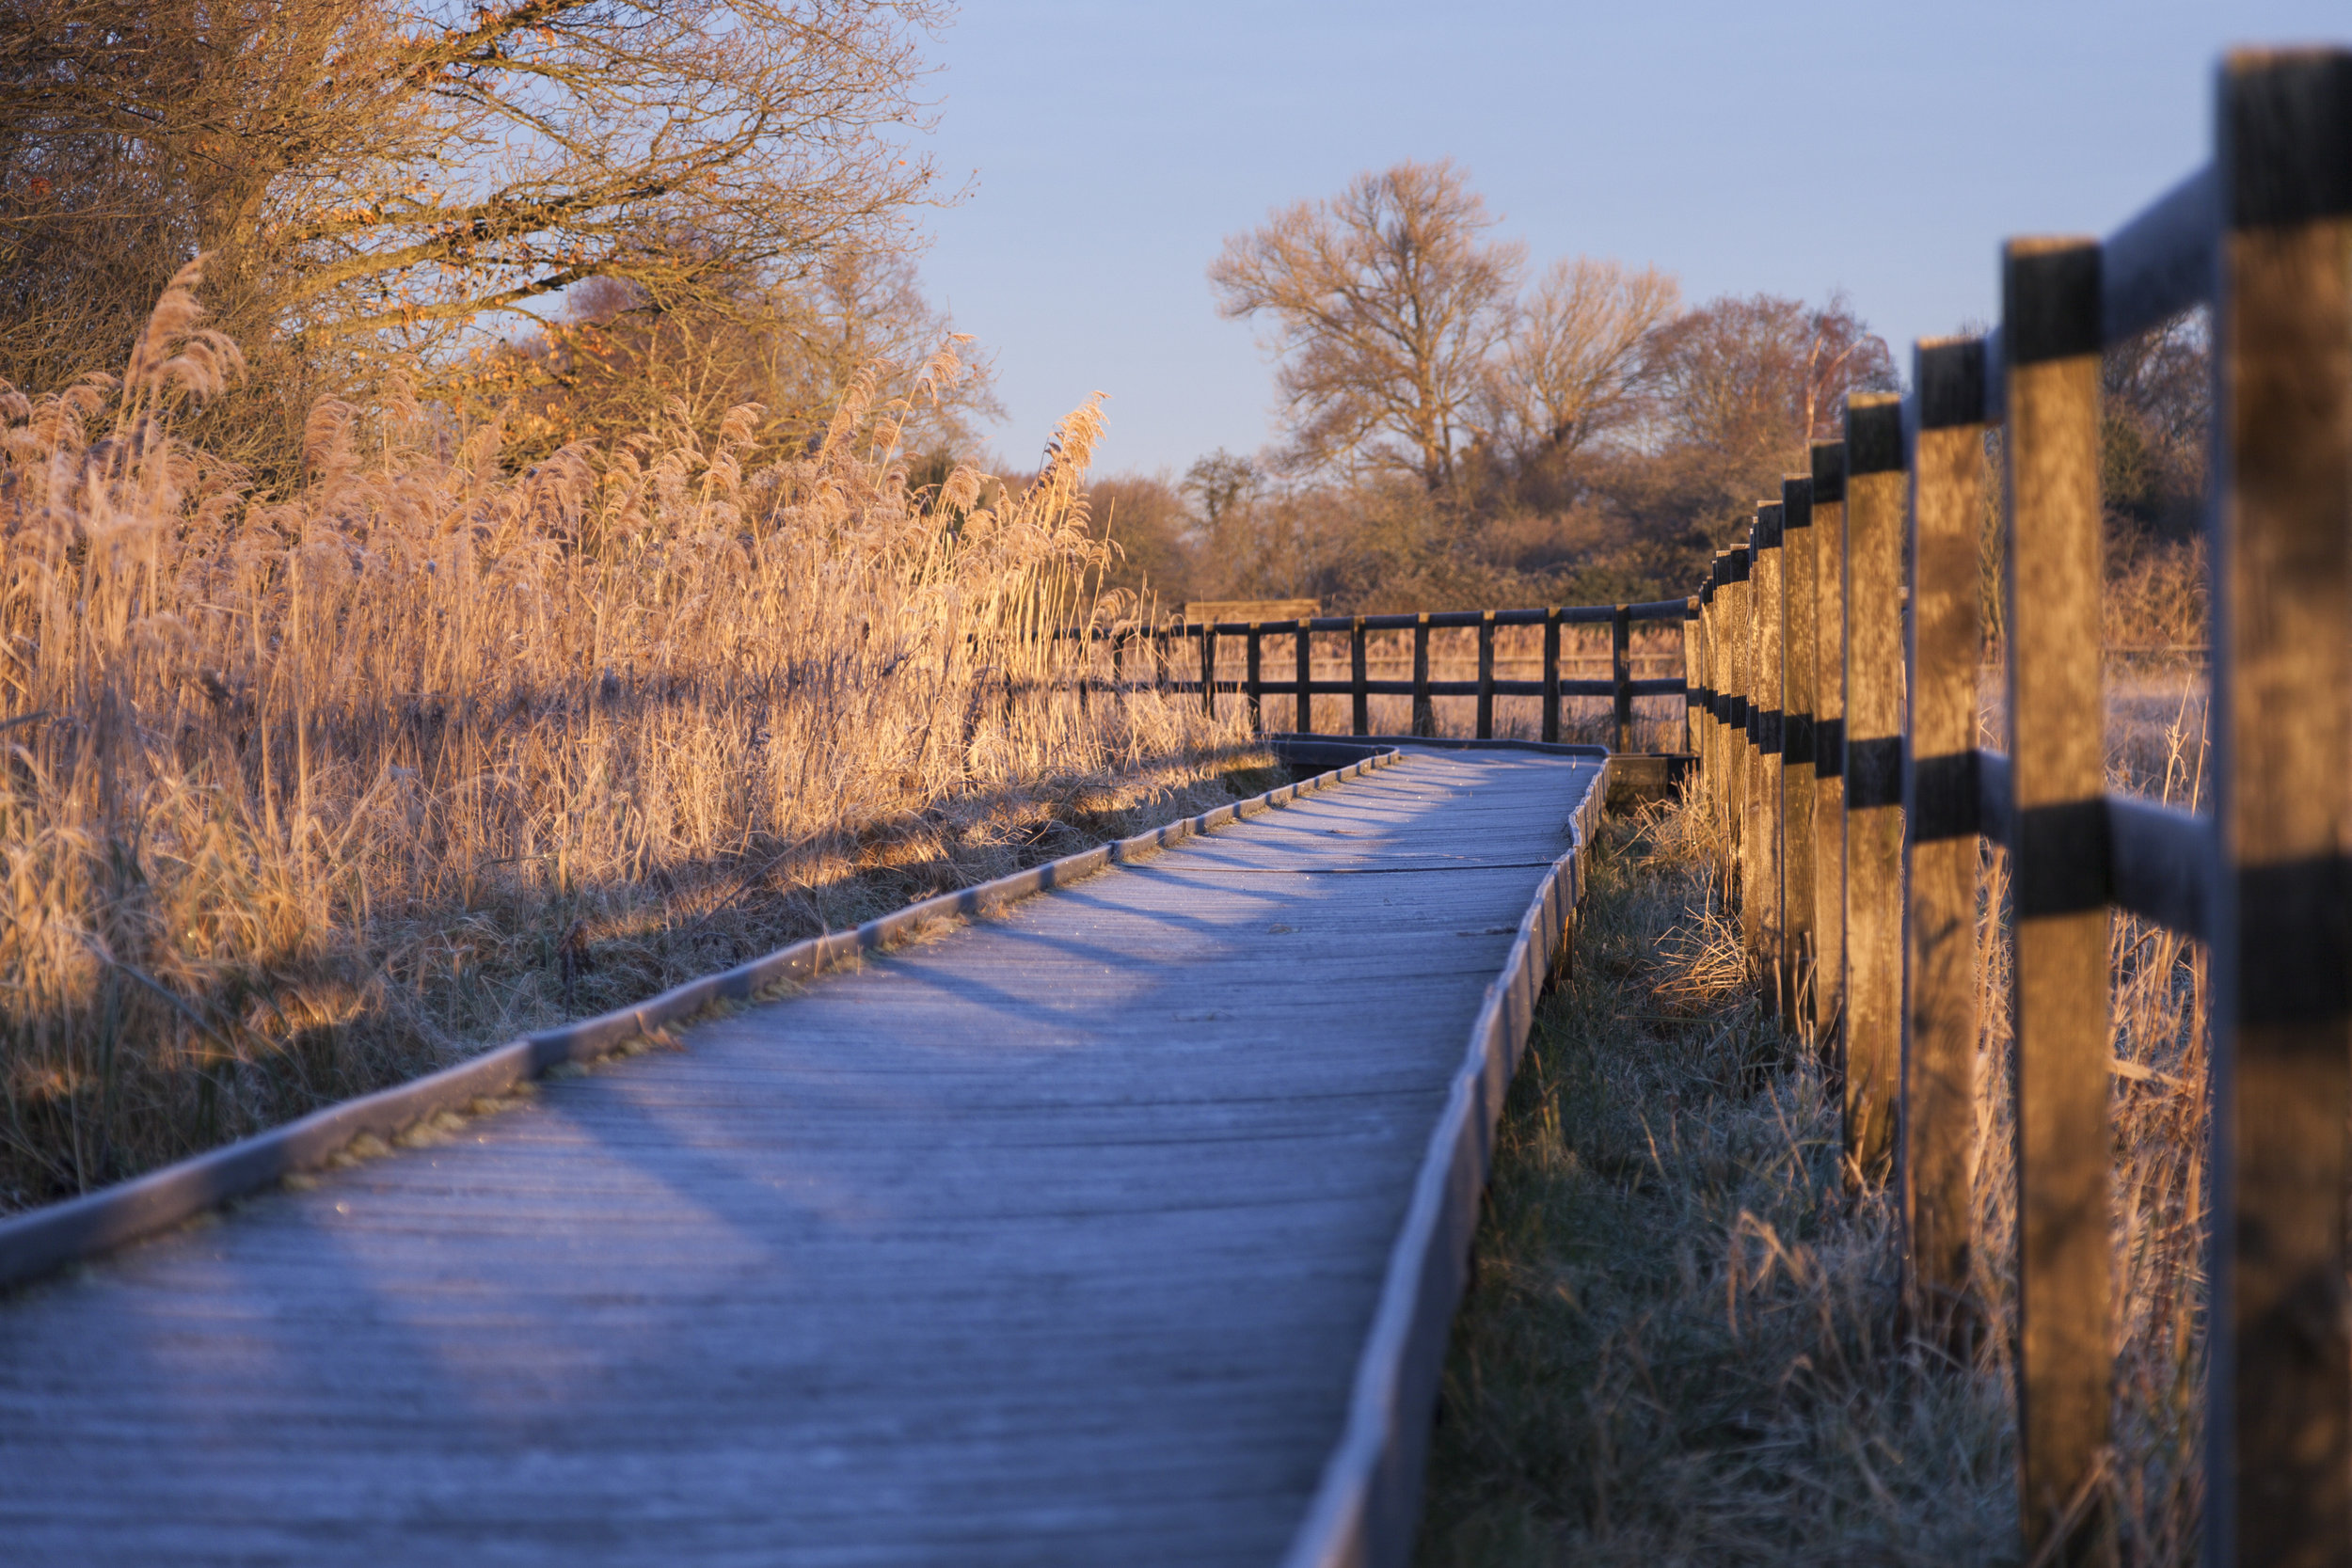 Wicken Fen National Trust Images Justin Minns 1294530.jpg